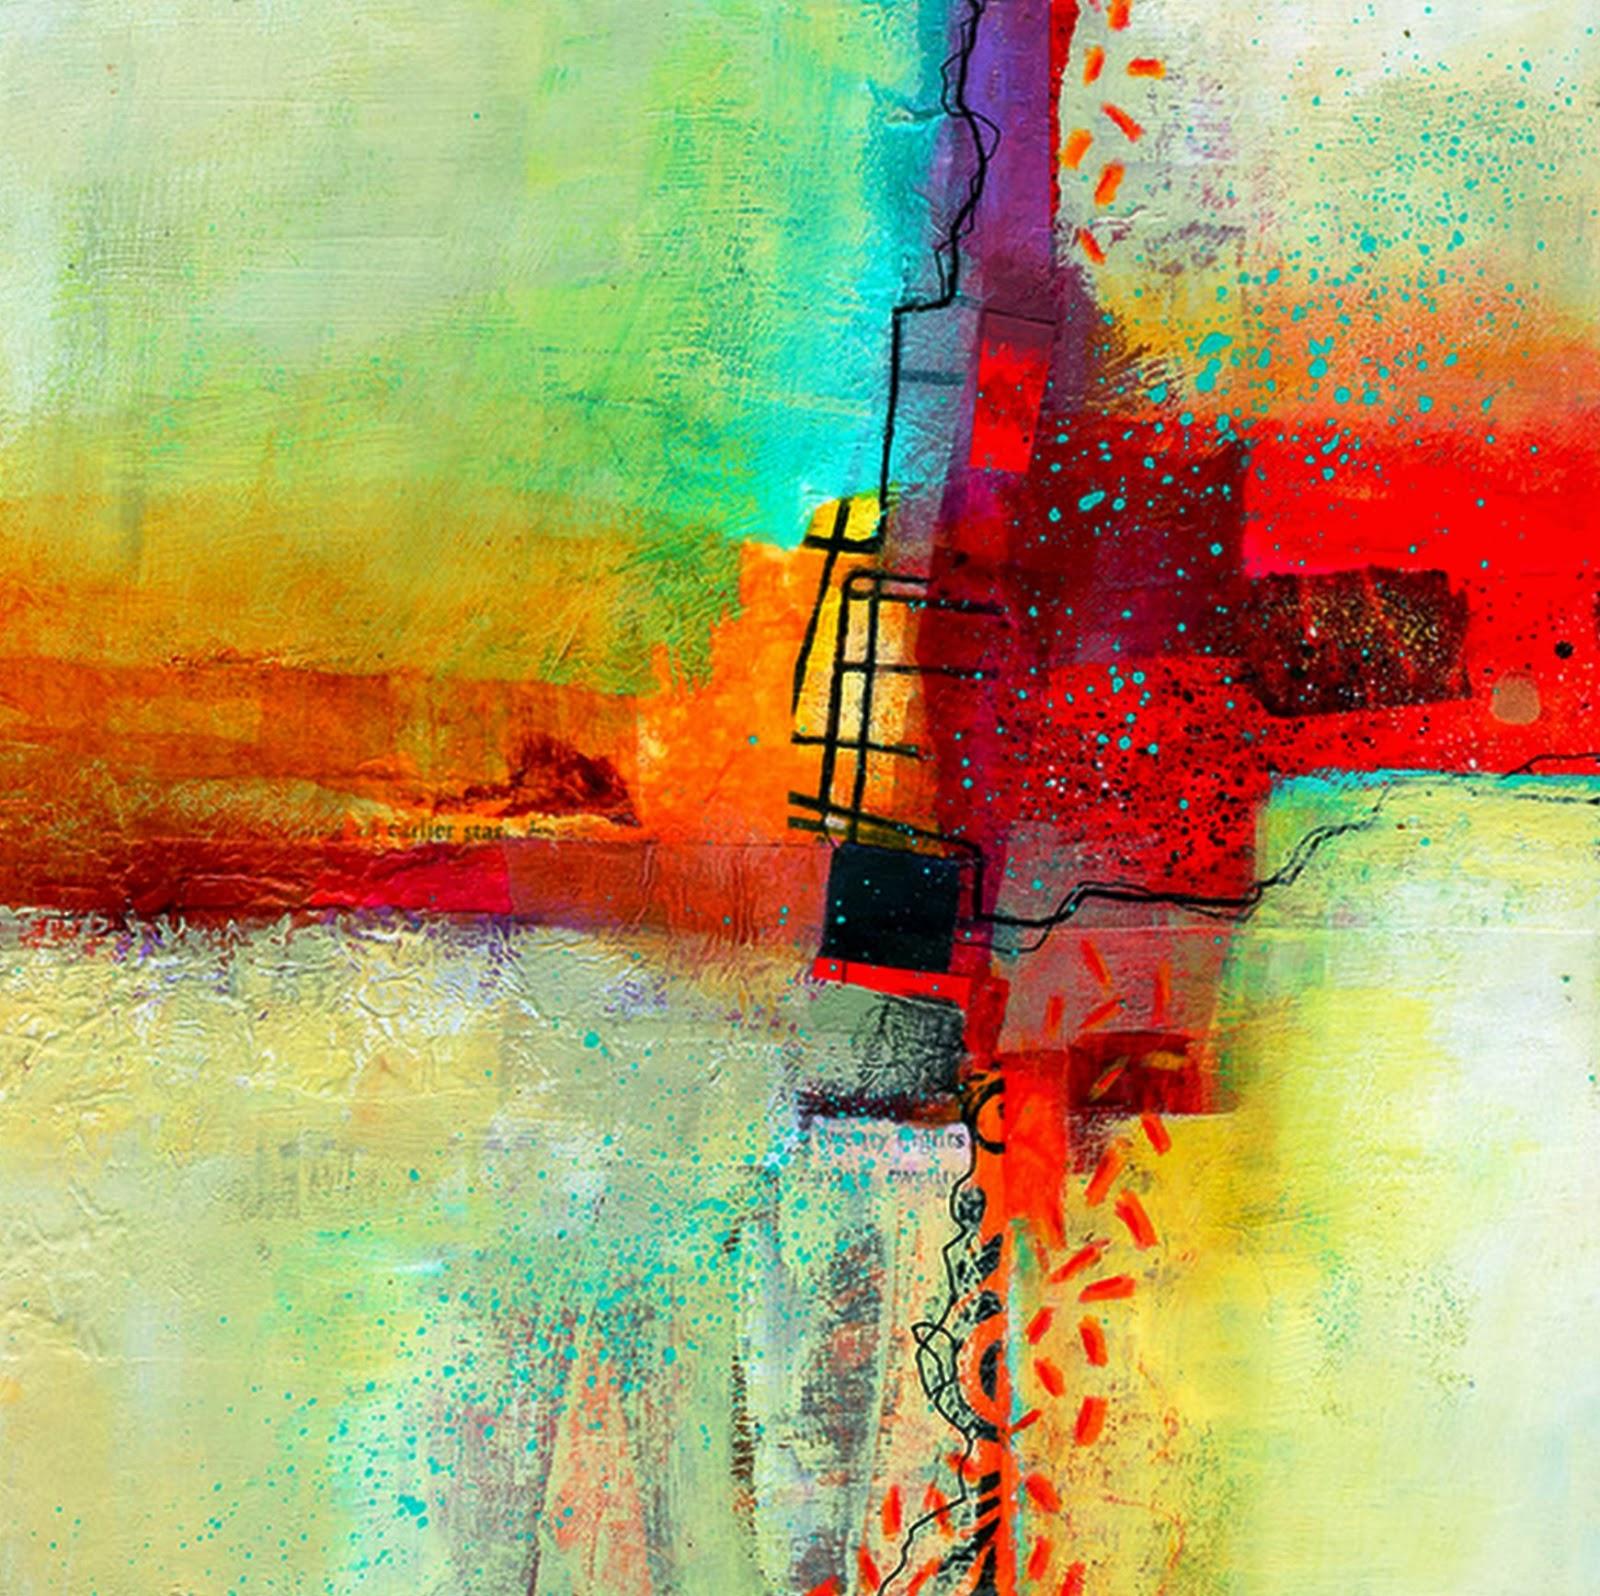 pintura-abstracta-expresionista